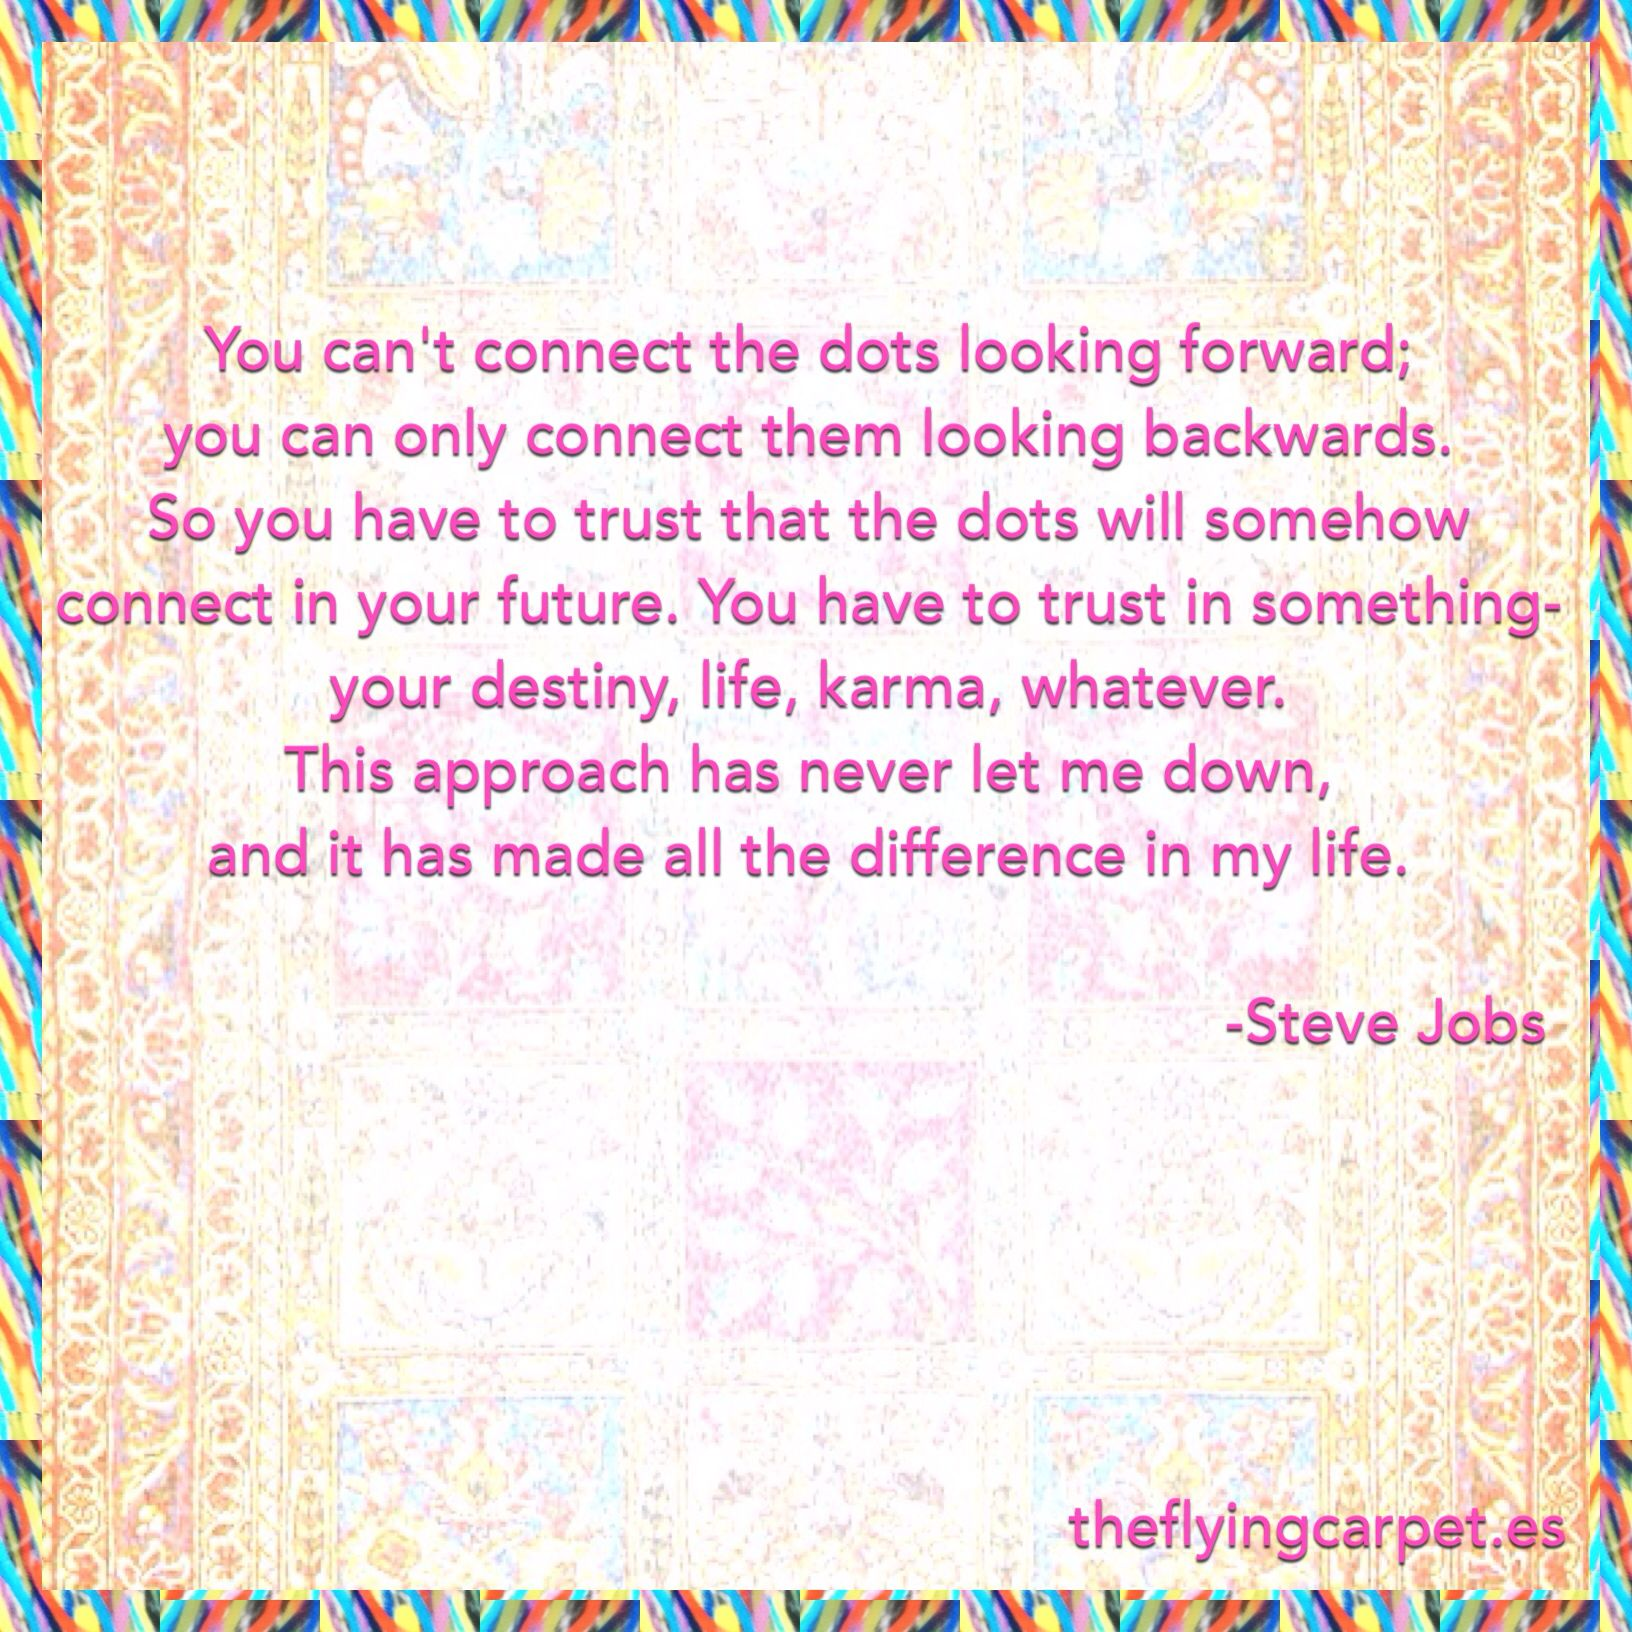 Steve Jobs On Karma Life And Destiny Fundfllyingcarpet 06